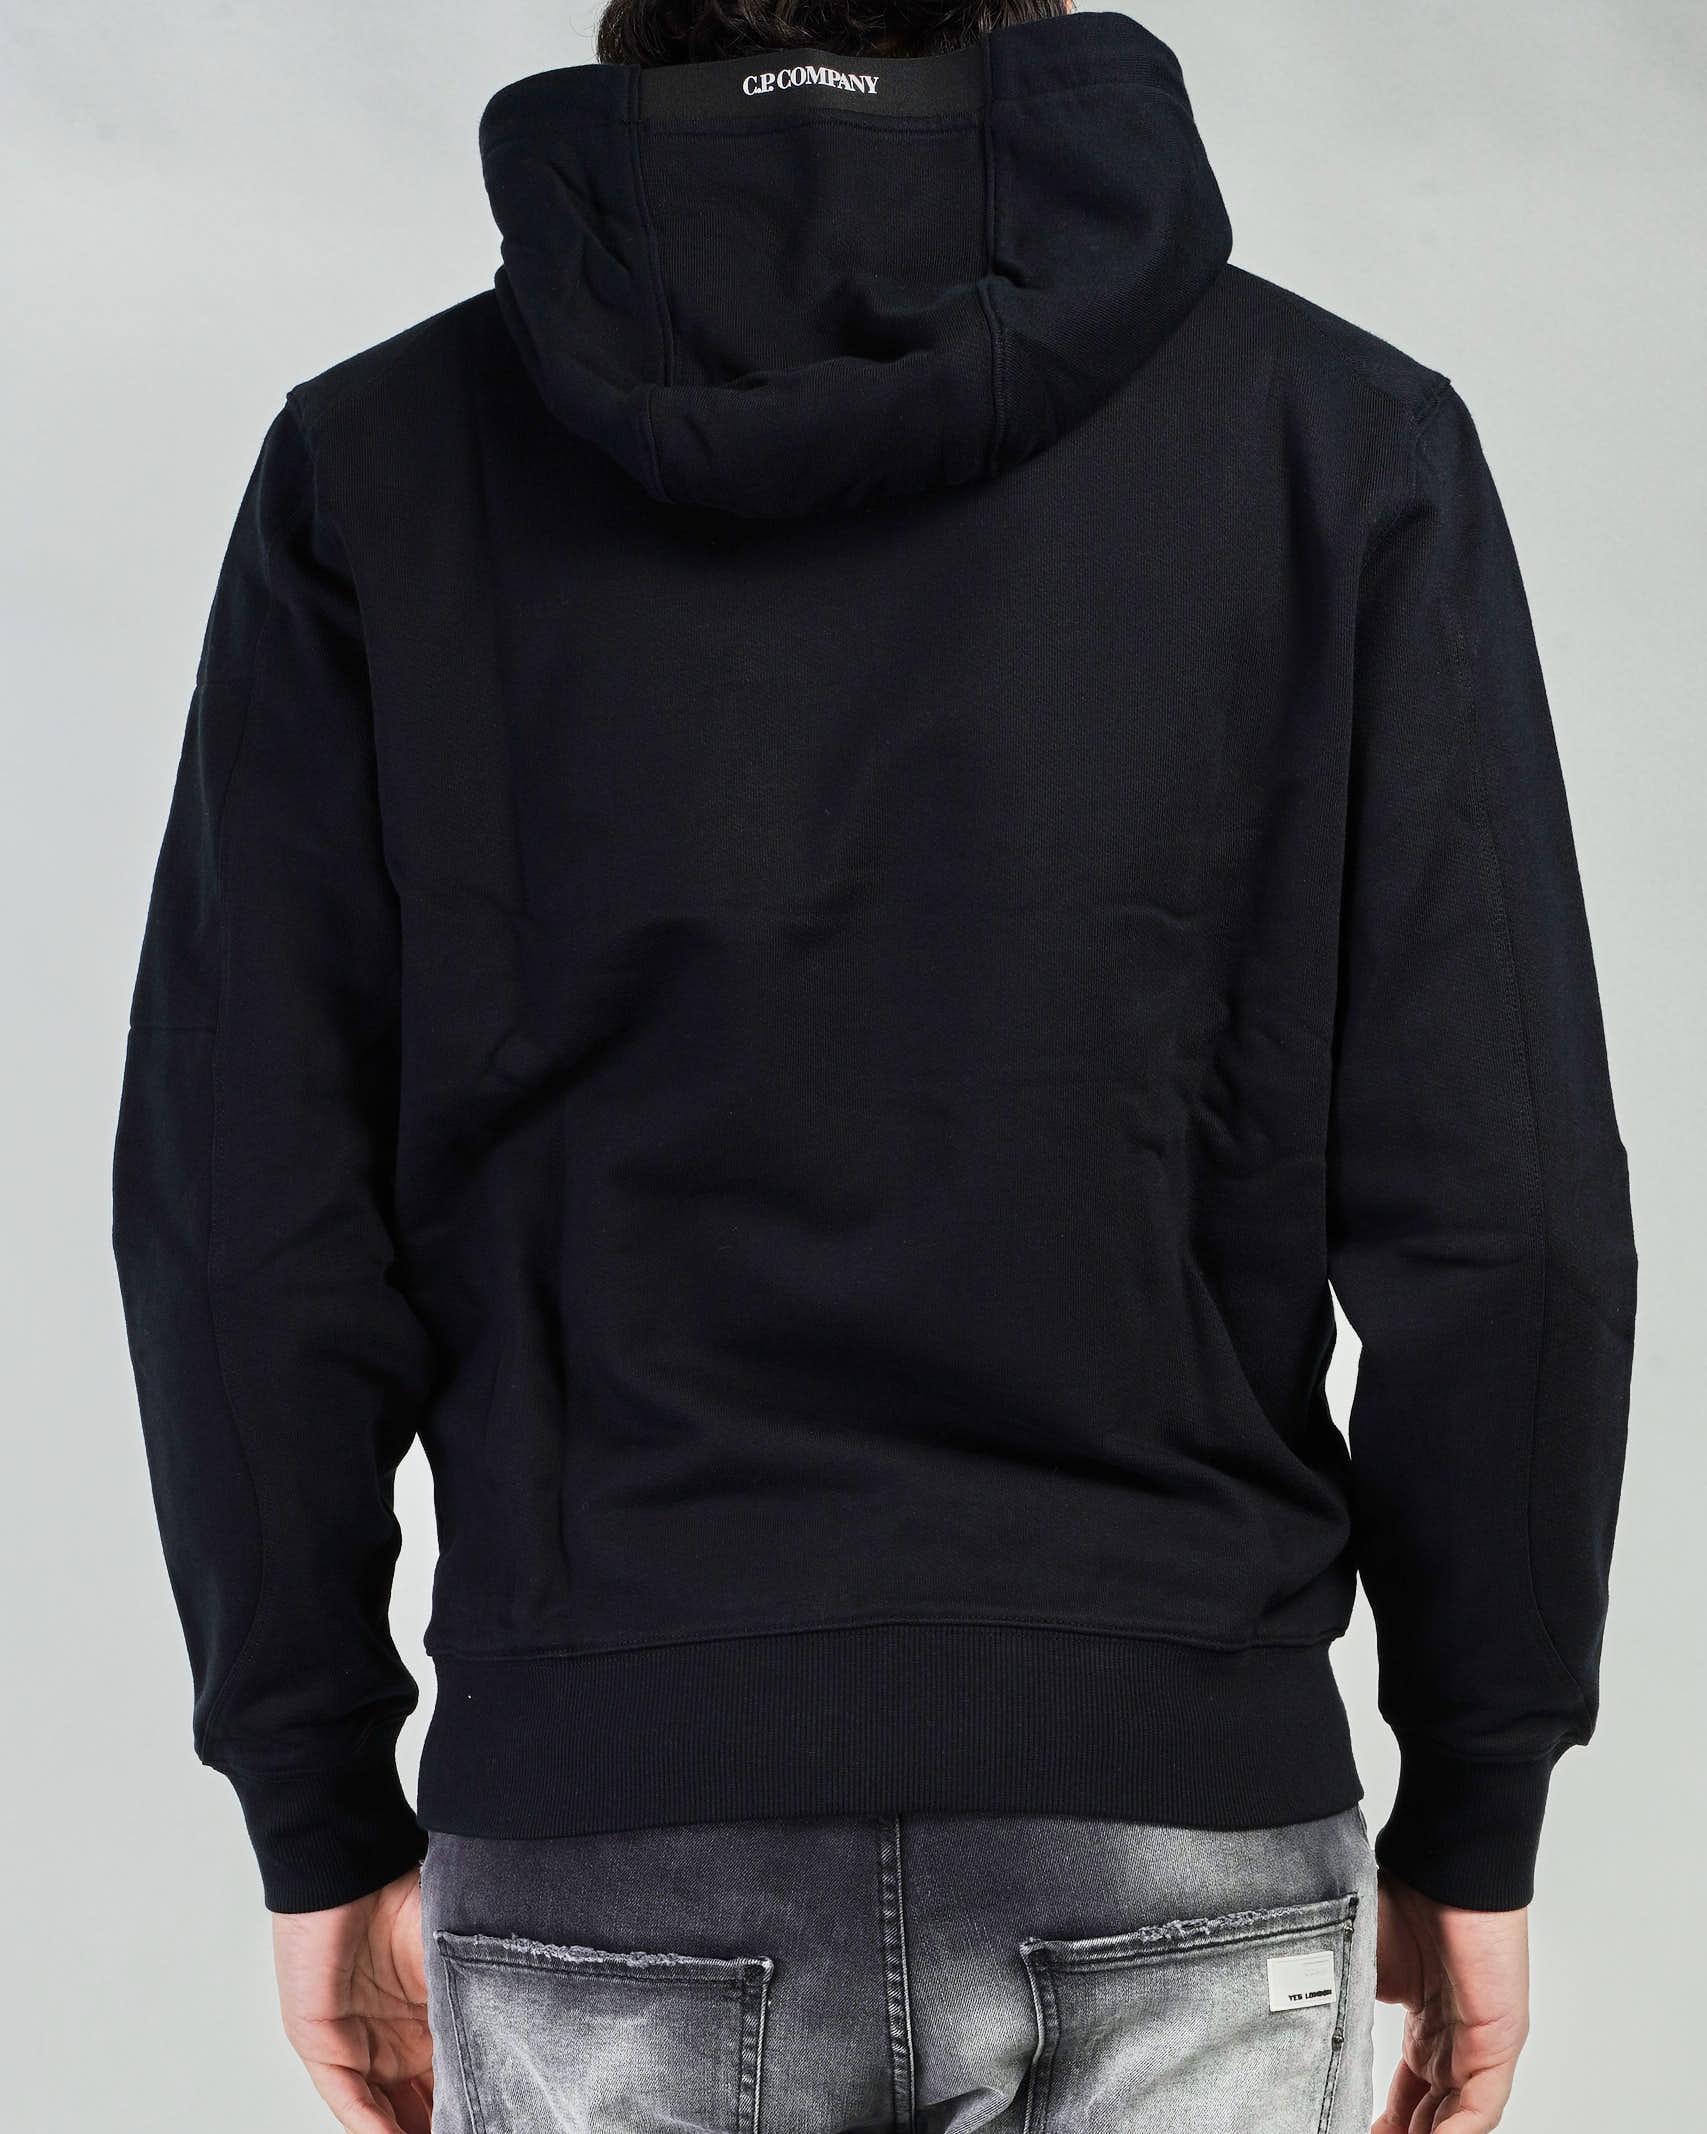 Felpa Diagonal Raised Fleece Garment Dyed Hoodie C.P. Company C.P. COMPANY | Felpa | 10CMSS047A005086W999